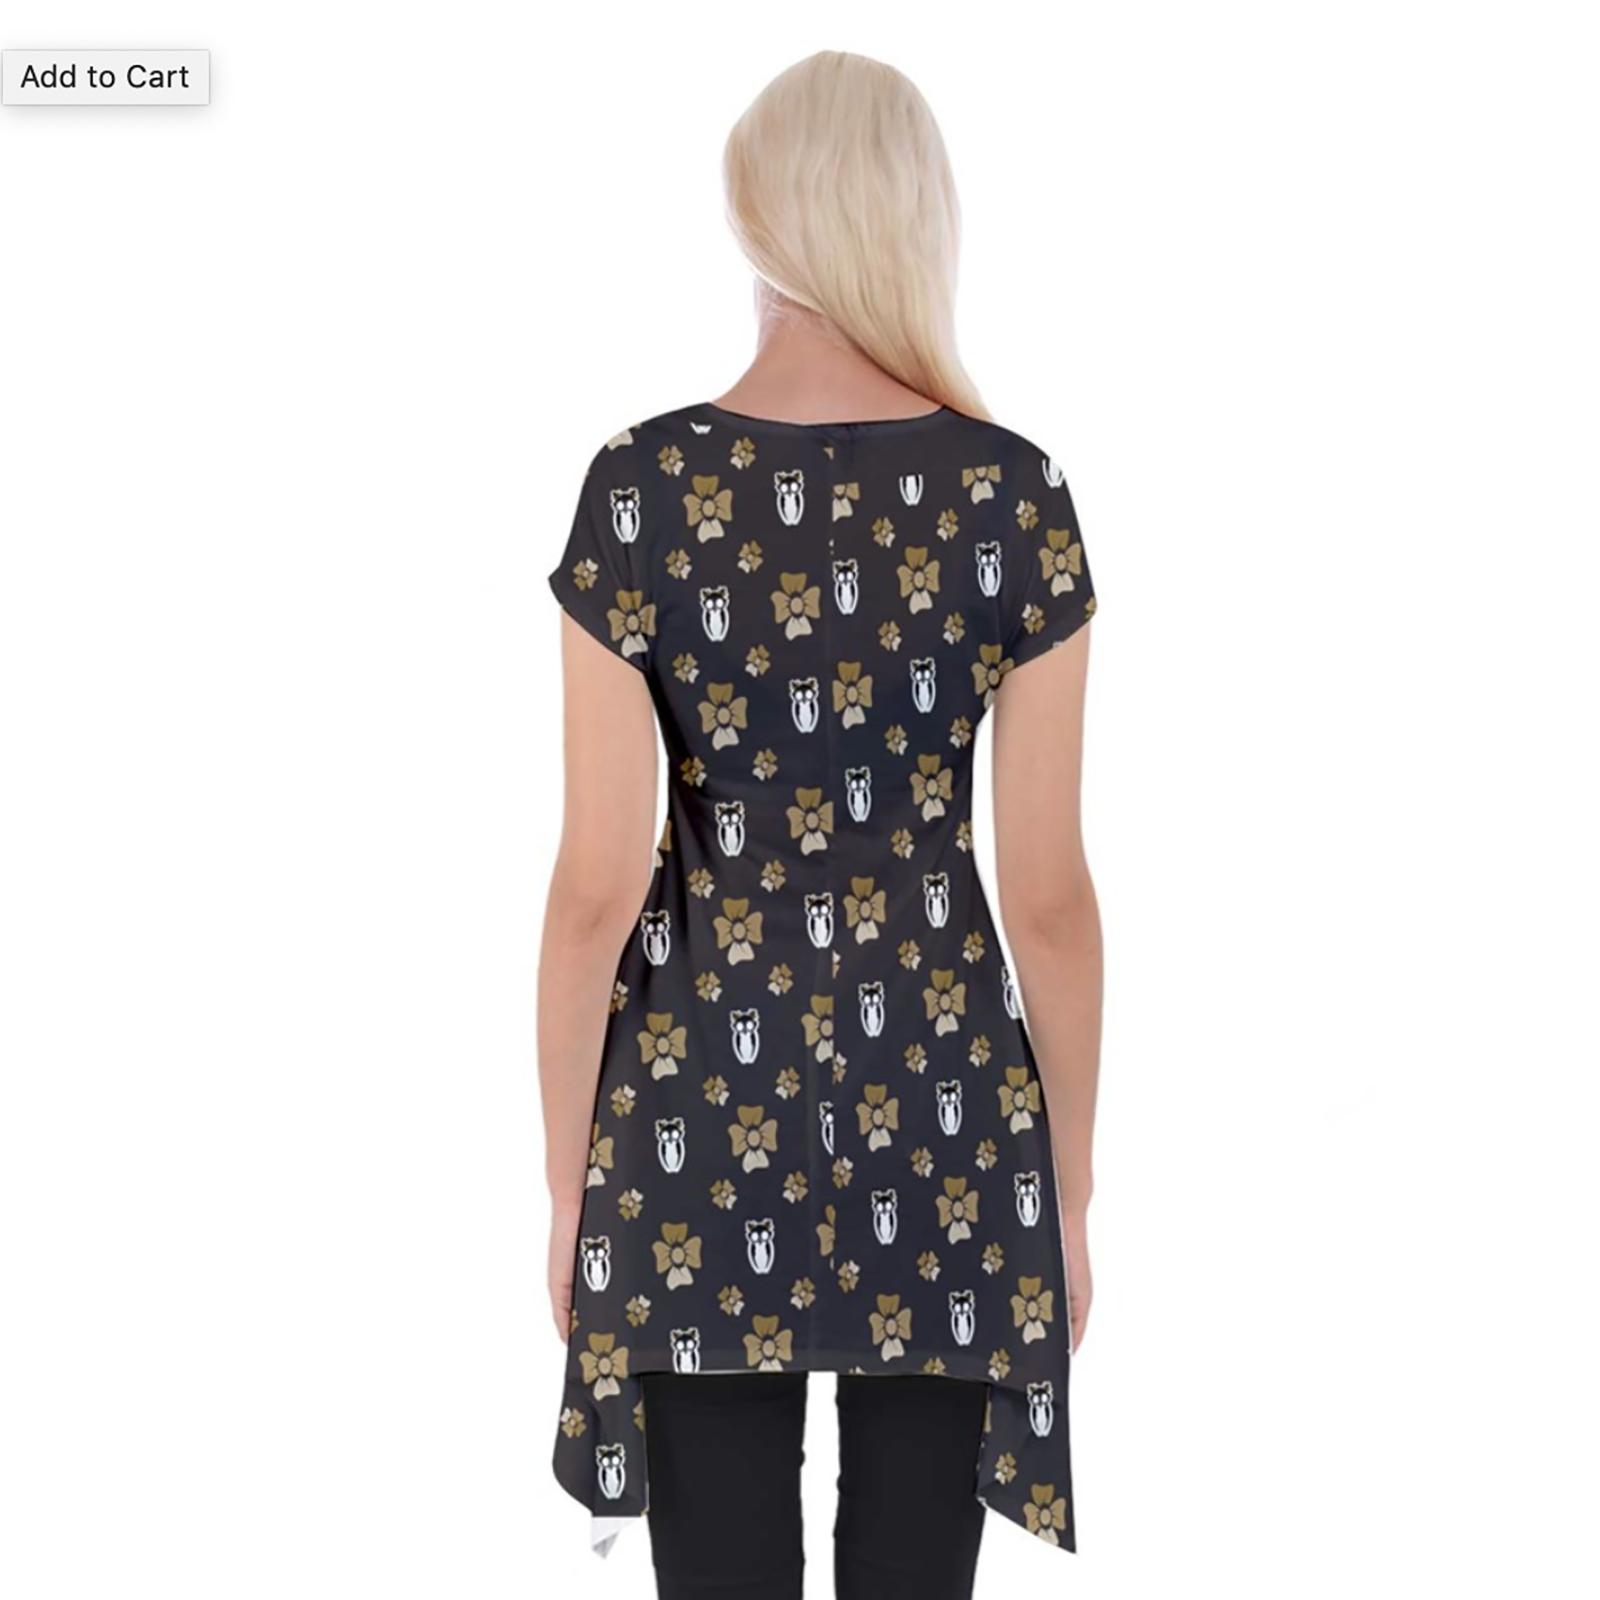 Yellow & Black Pattern Women's Short Sleeve Side Drop Tunic - Inspired by Hufflepuff